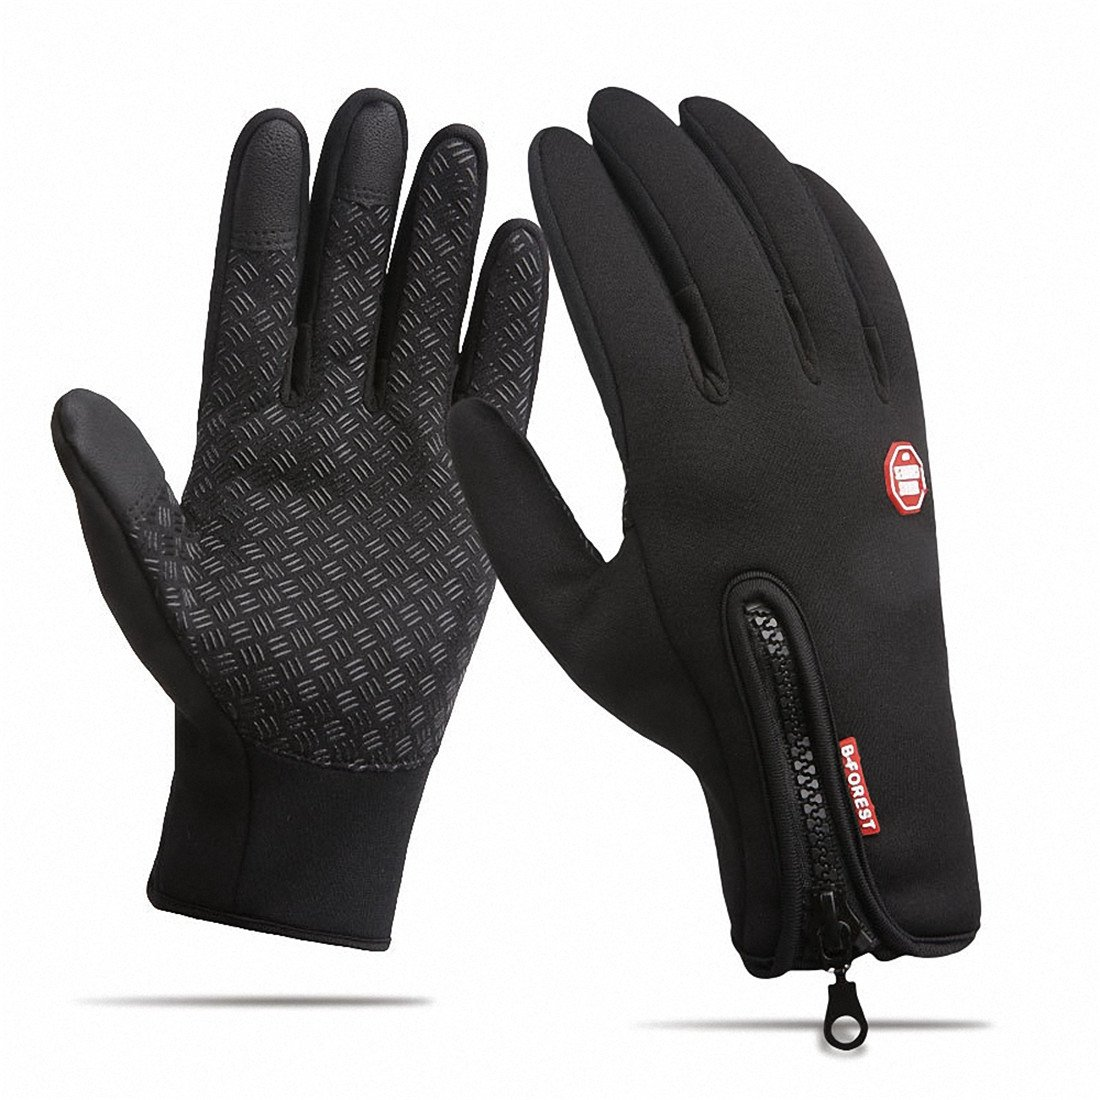 Waterproof Touchscreen Cycling Gloves Winter Warm Full Finger Outdoor Ski Snow Bike Women Men Adjustable Size Glove for Smart Phone,Black,M /Plam width:3.14in